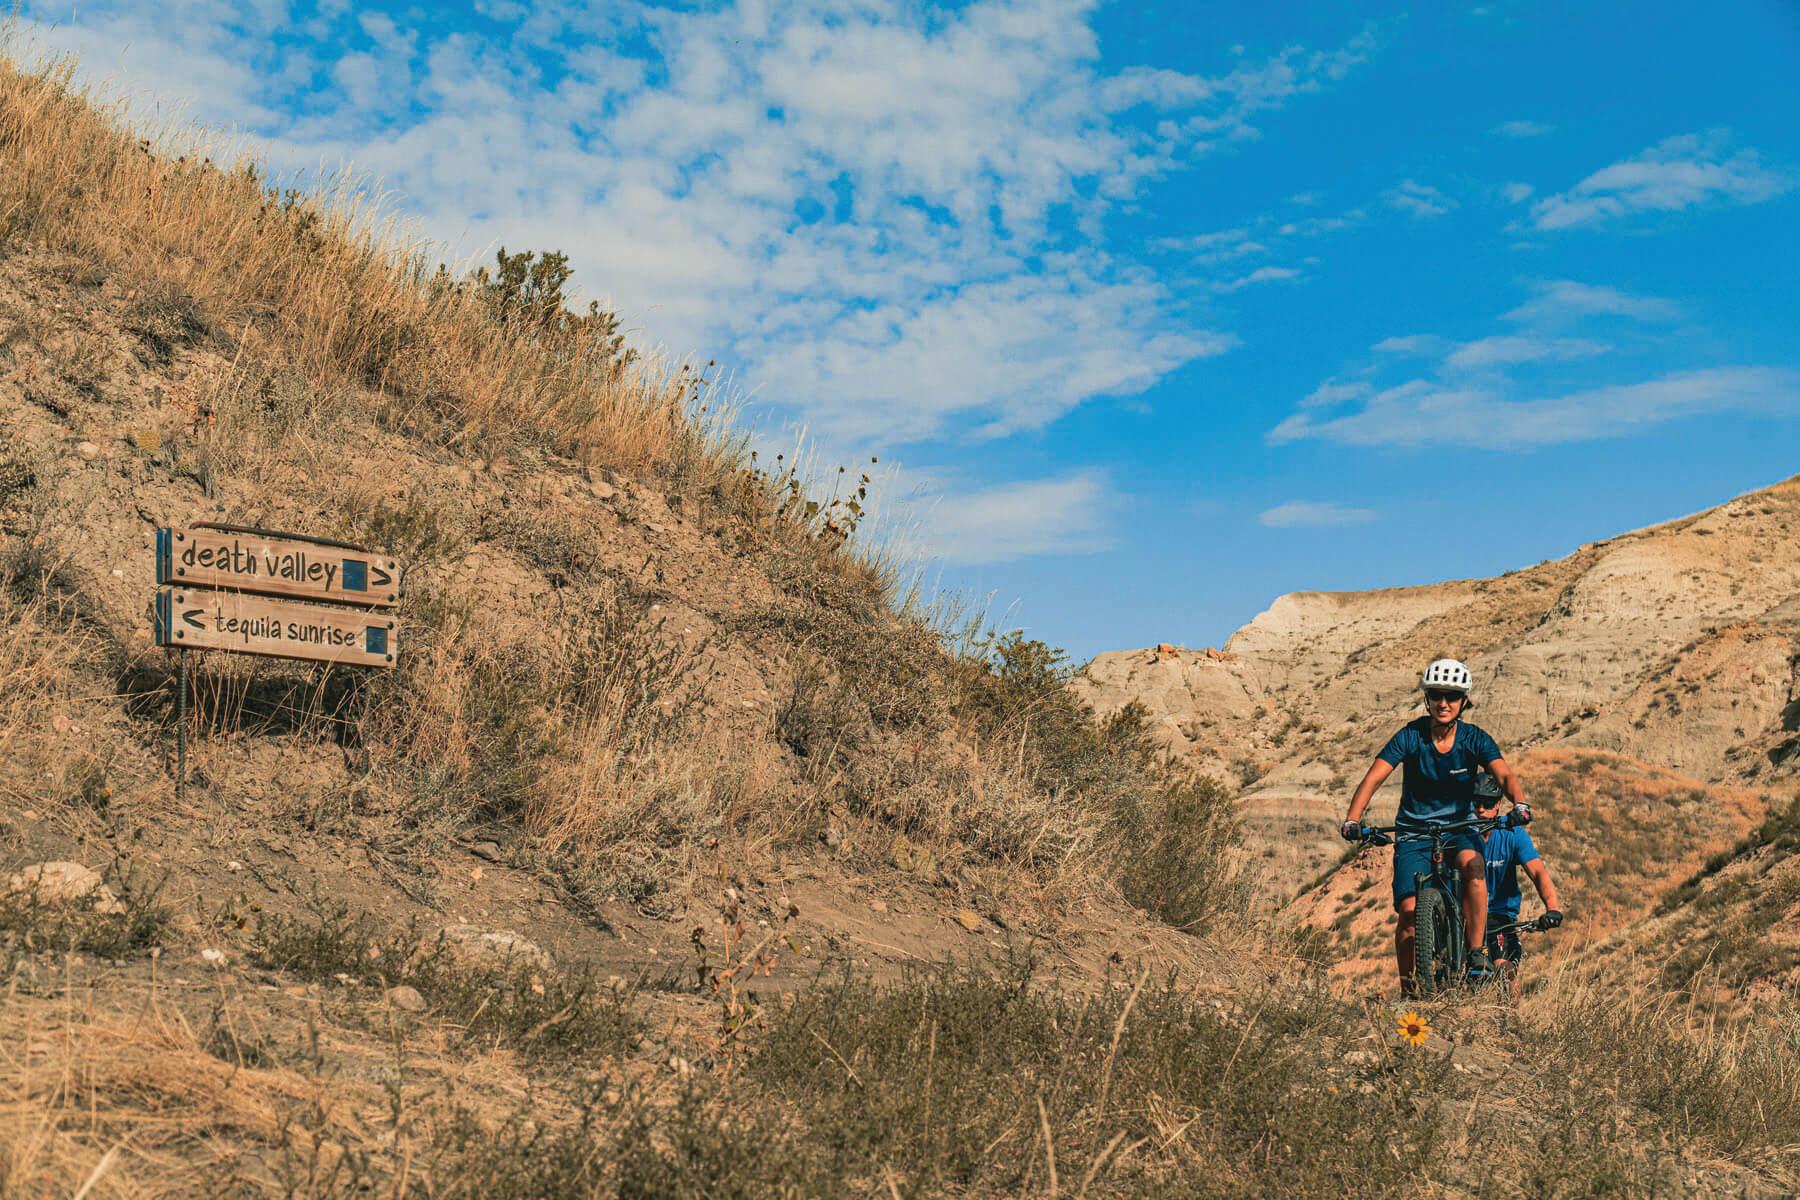 A biker rides through the bike trail along the South Saskatchewan River in Medicine Hat.